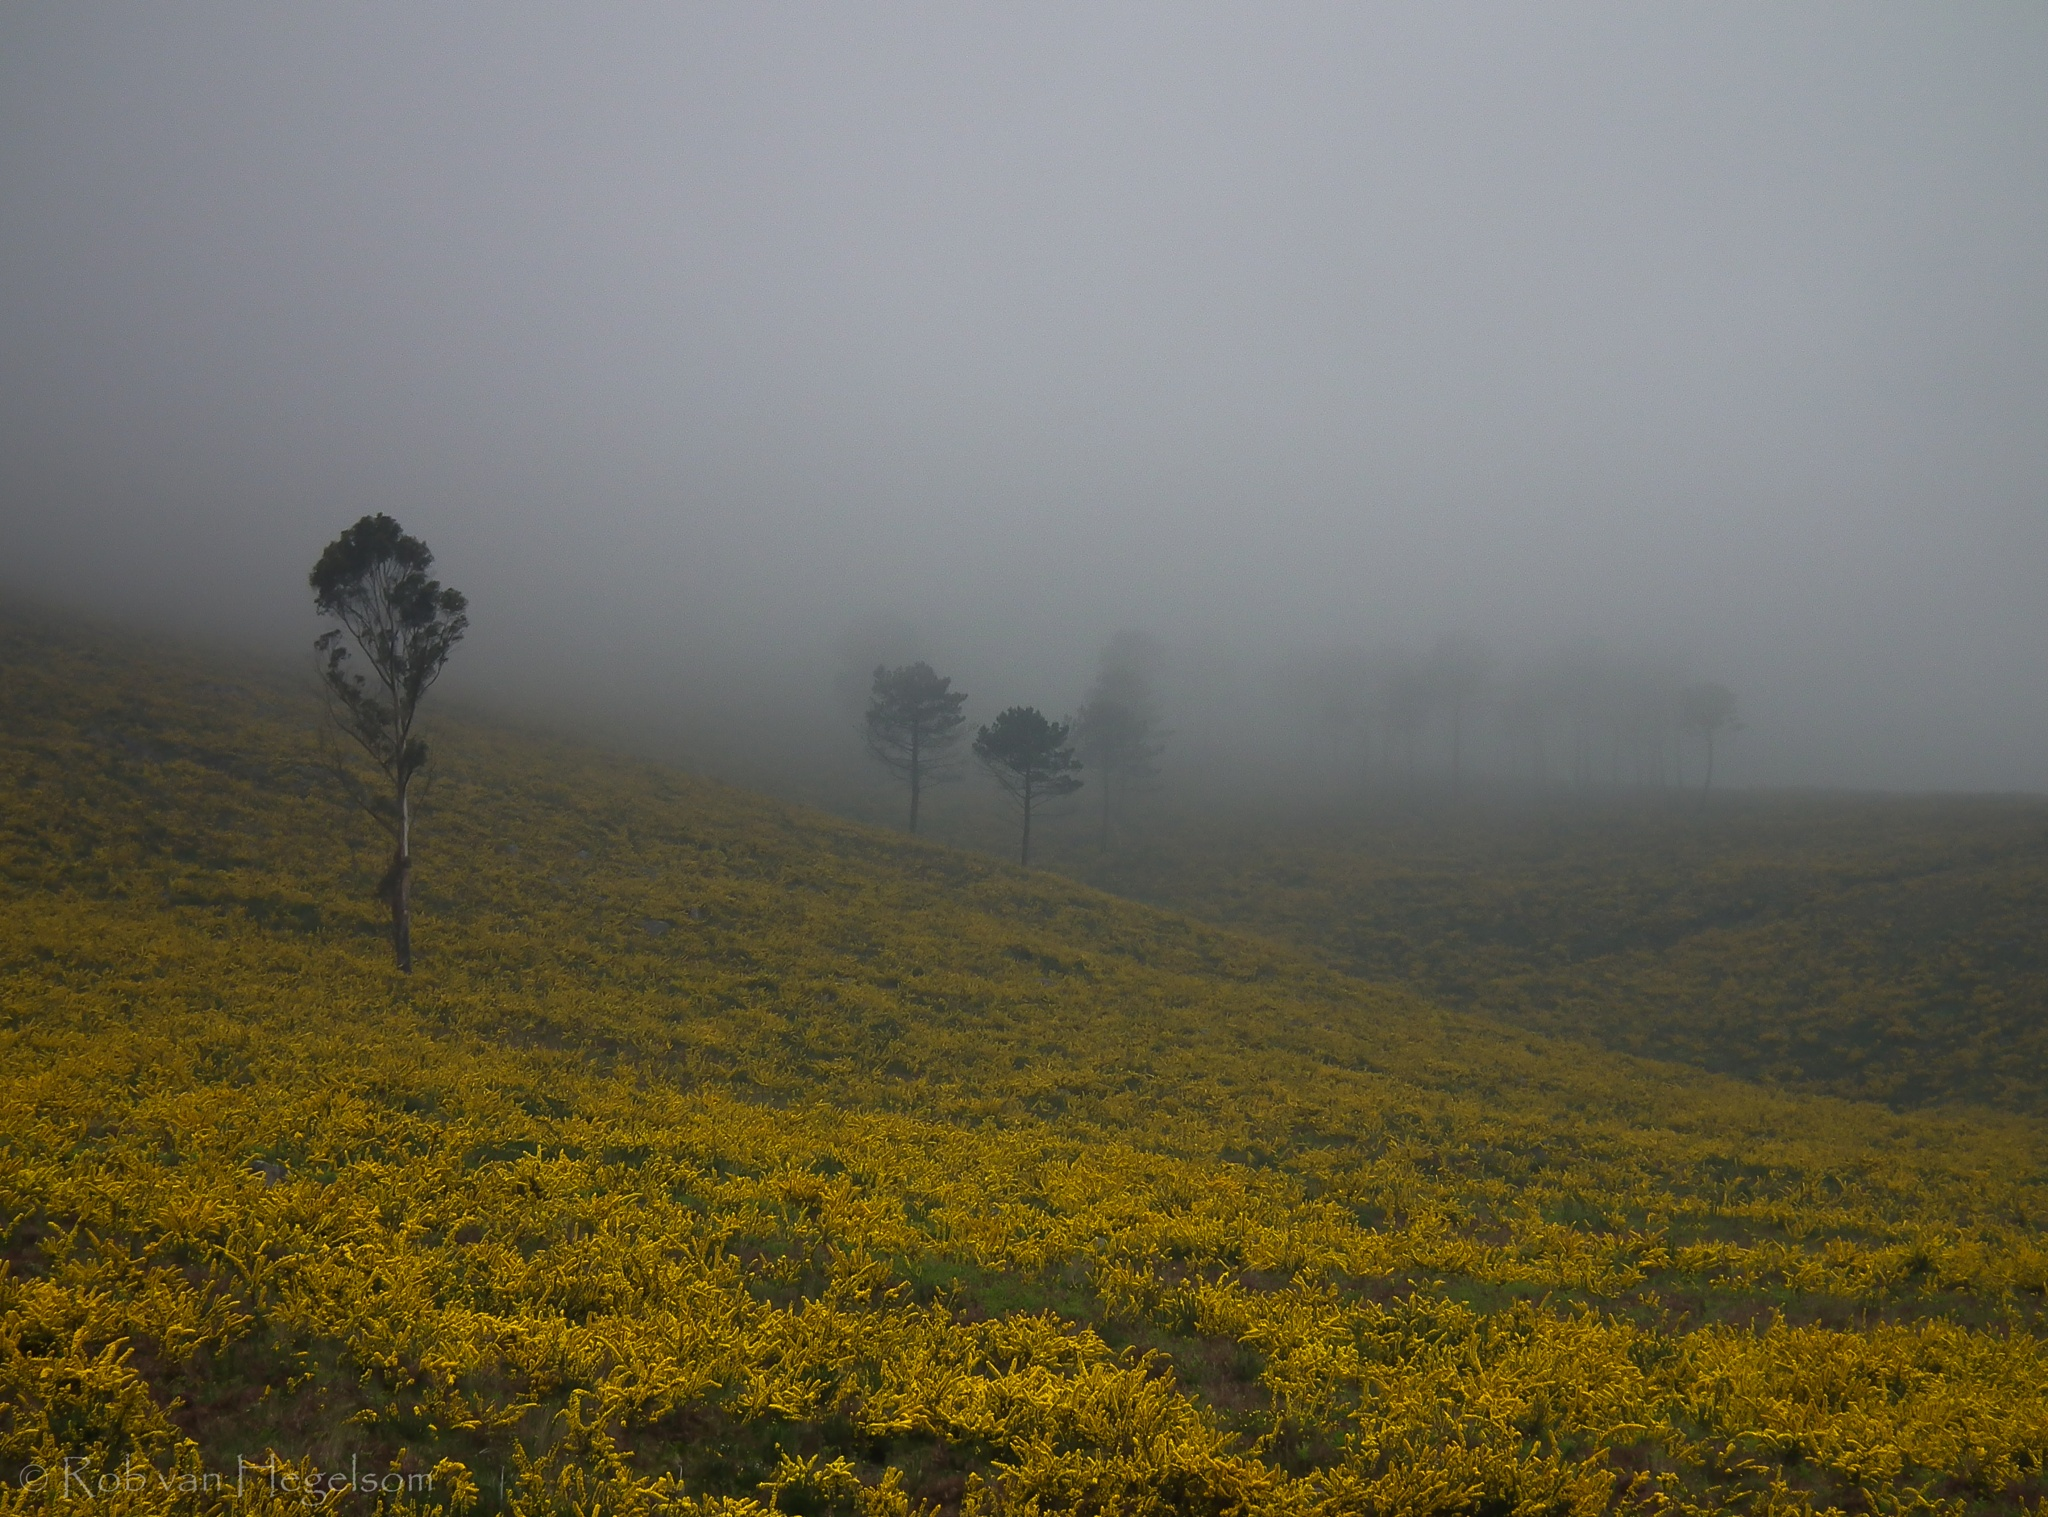 Misty morning by rvanhegelsom